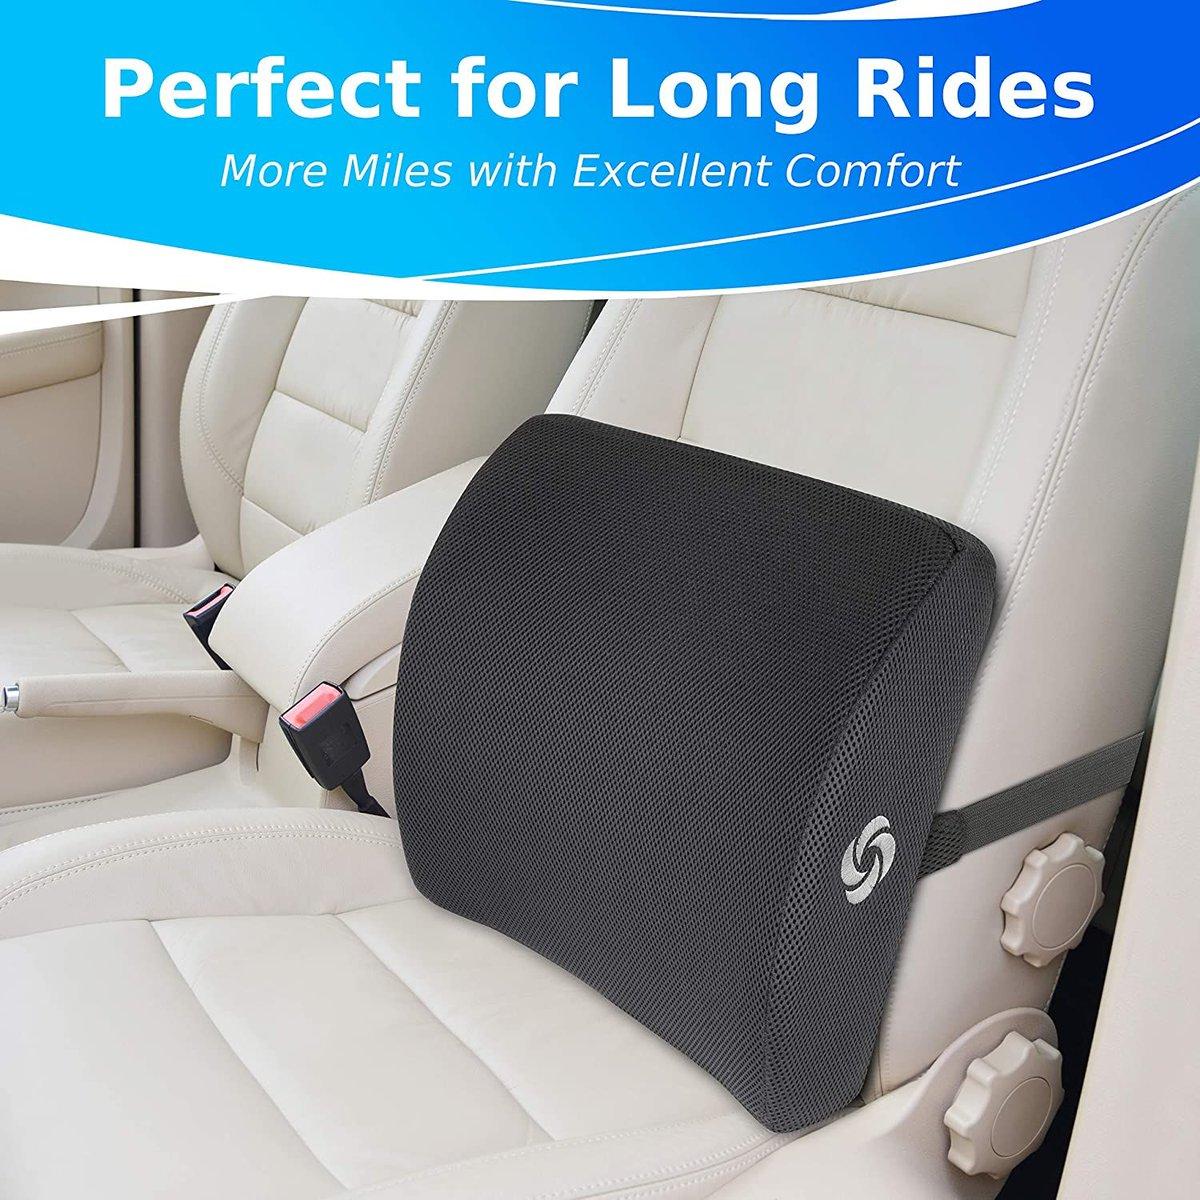 ad: $19.99 (33% off)  SAMSONITE Ergonomic Lumbar Support Pillow   Link0  Link0